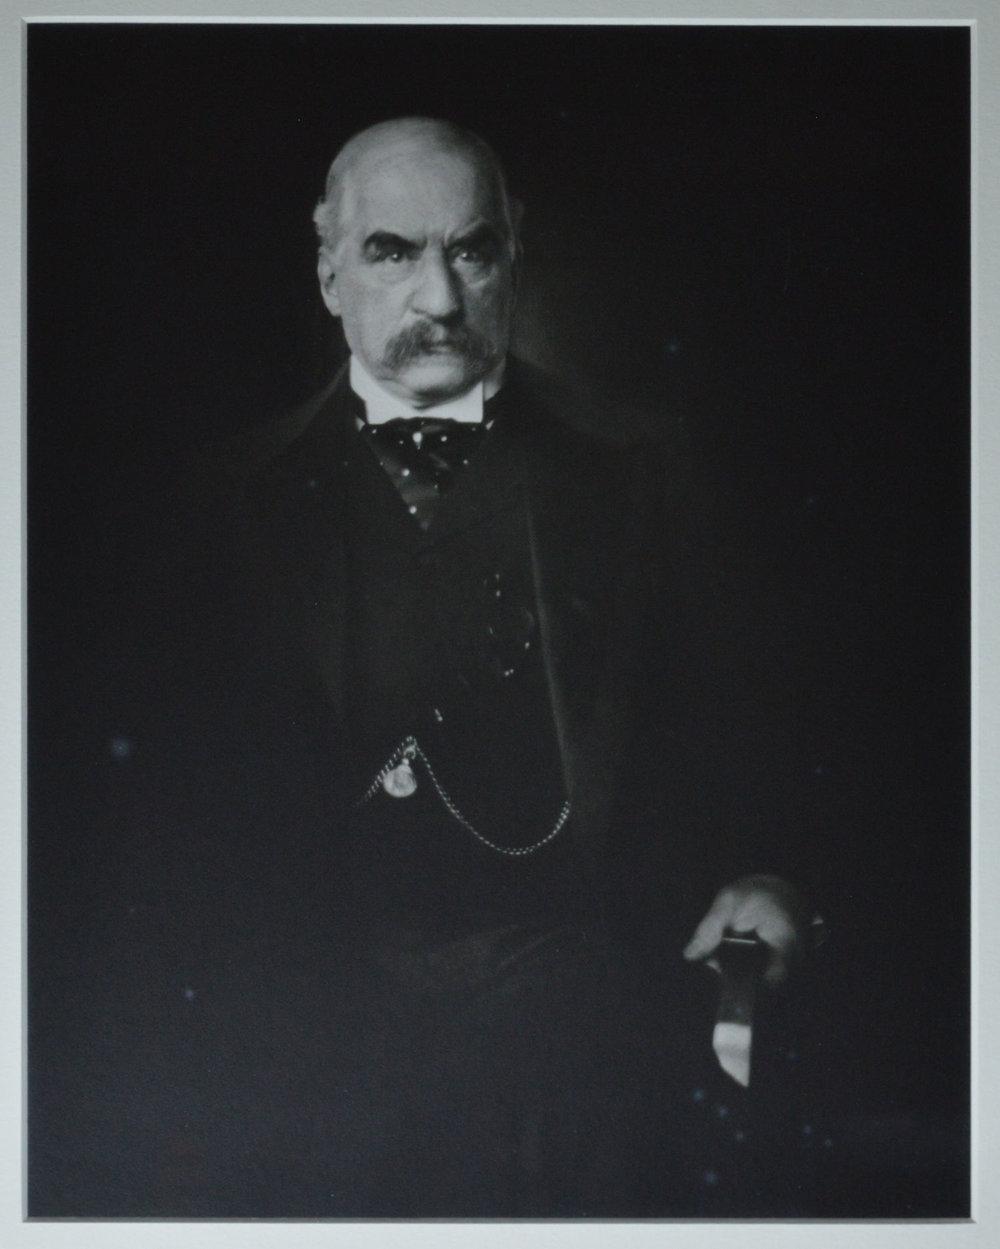 Steichen - J P Morgan, 1903.jpg